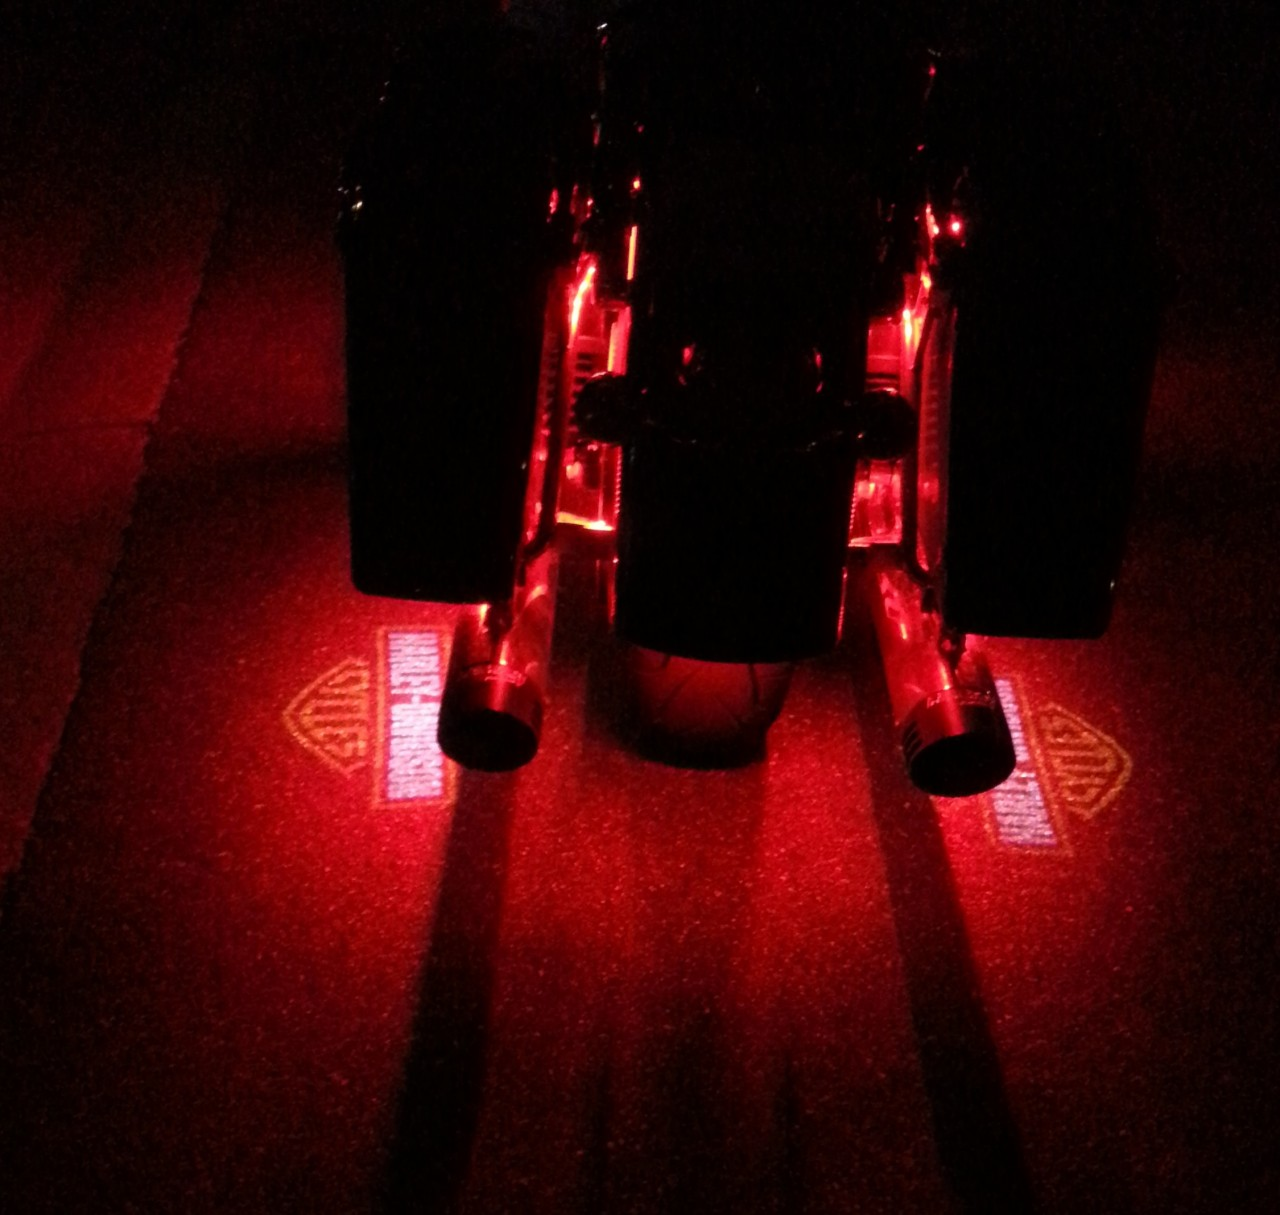 Harley Davidson Hologram Light Kits Fusion Led Systems